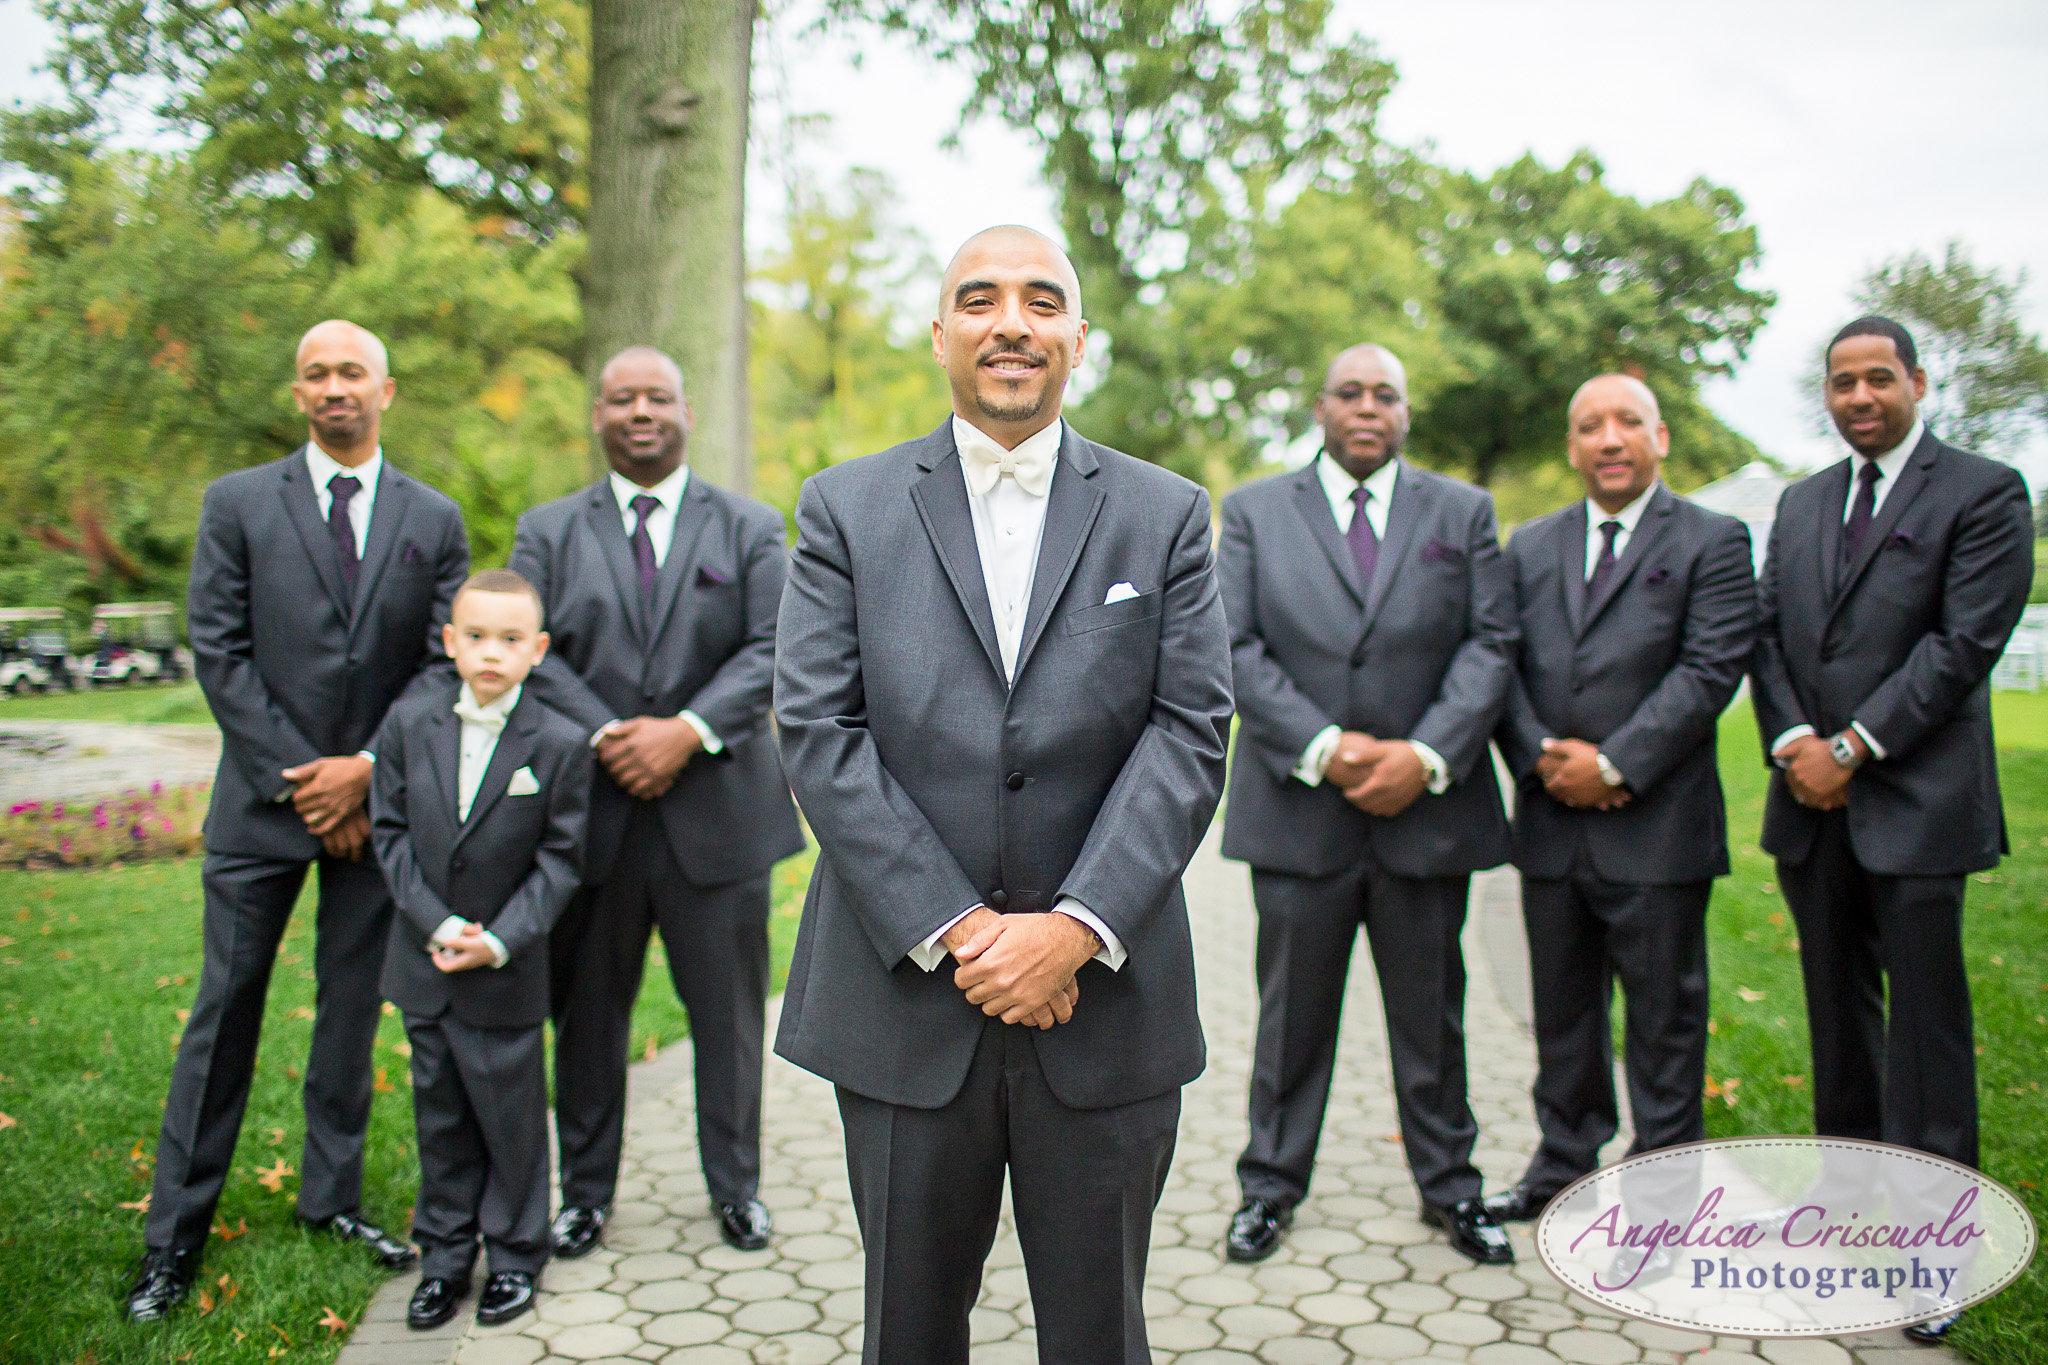 Groomsmen Photo Pelham Bay & Split Rock Golf Course Wedding in the Bronx